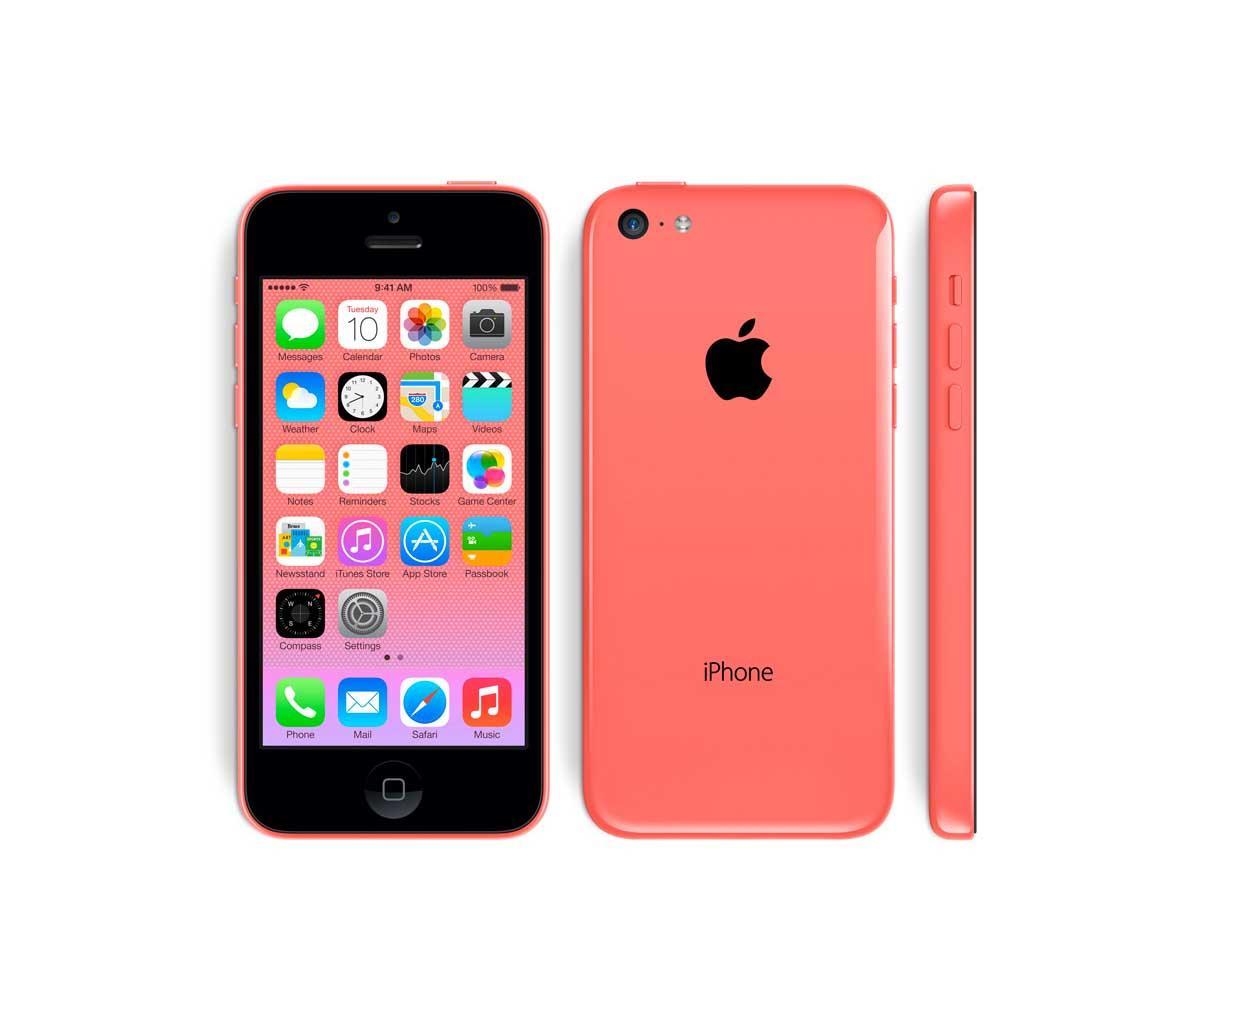 iPhone 5c undefinedGB Pink